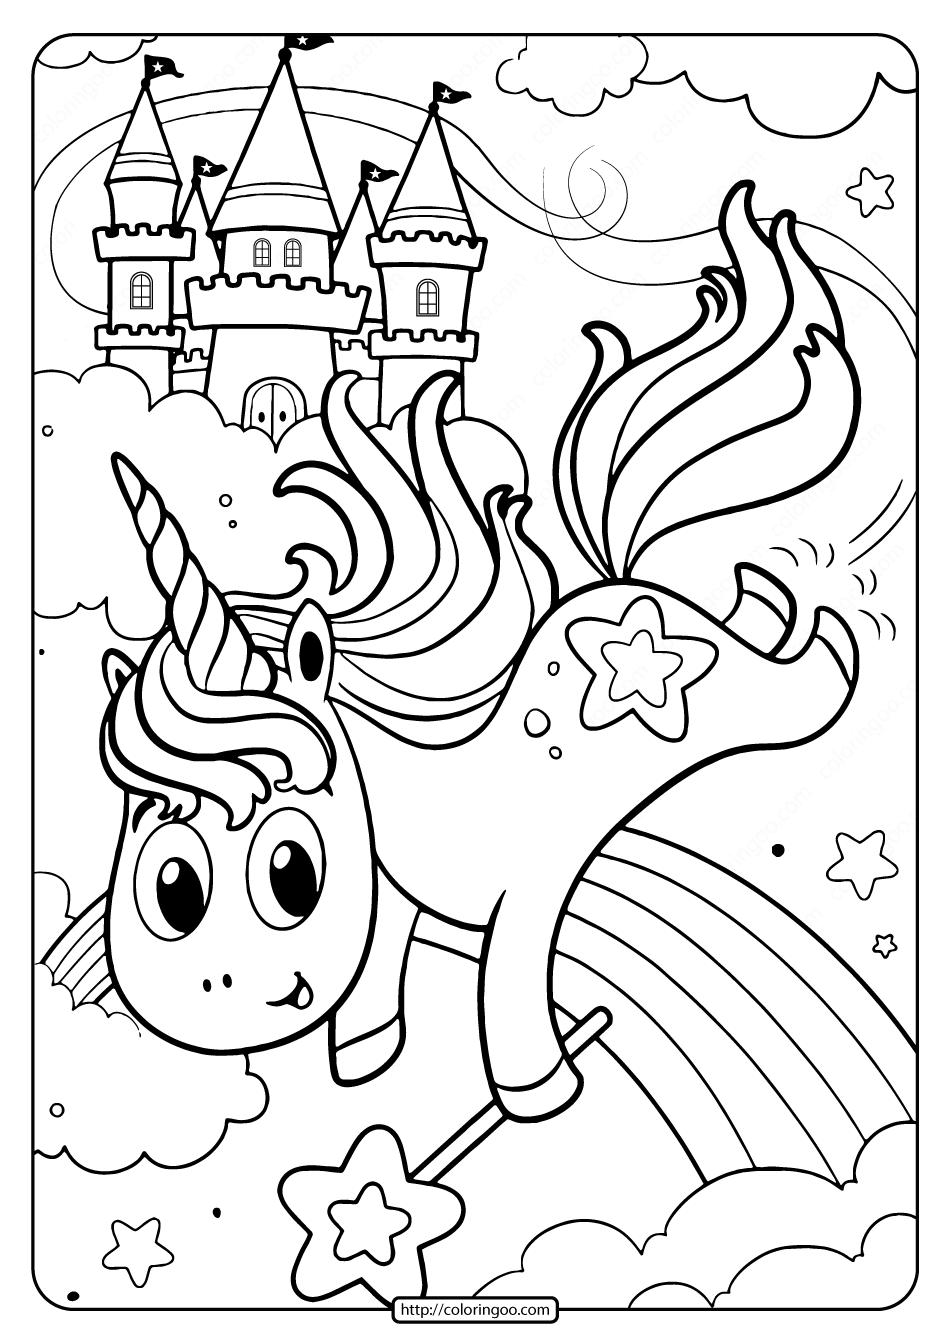 Uni-Creatures Unicorn Coloring Pages